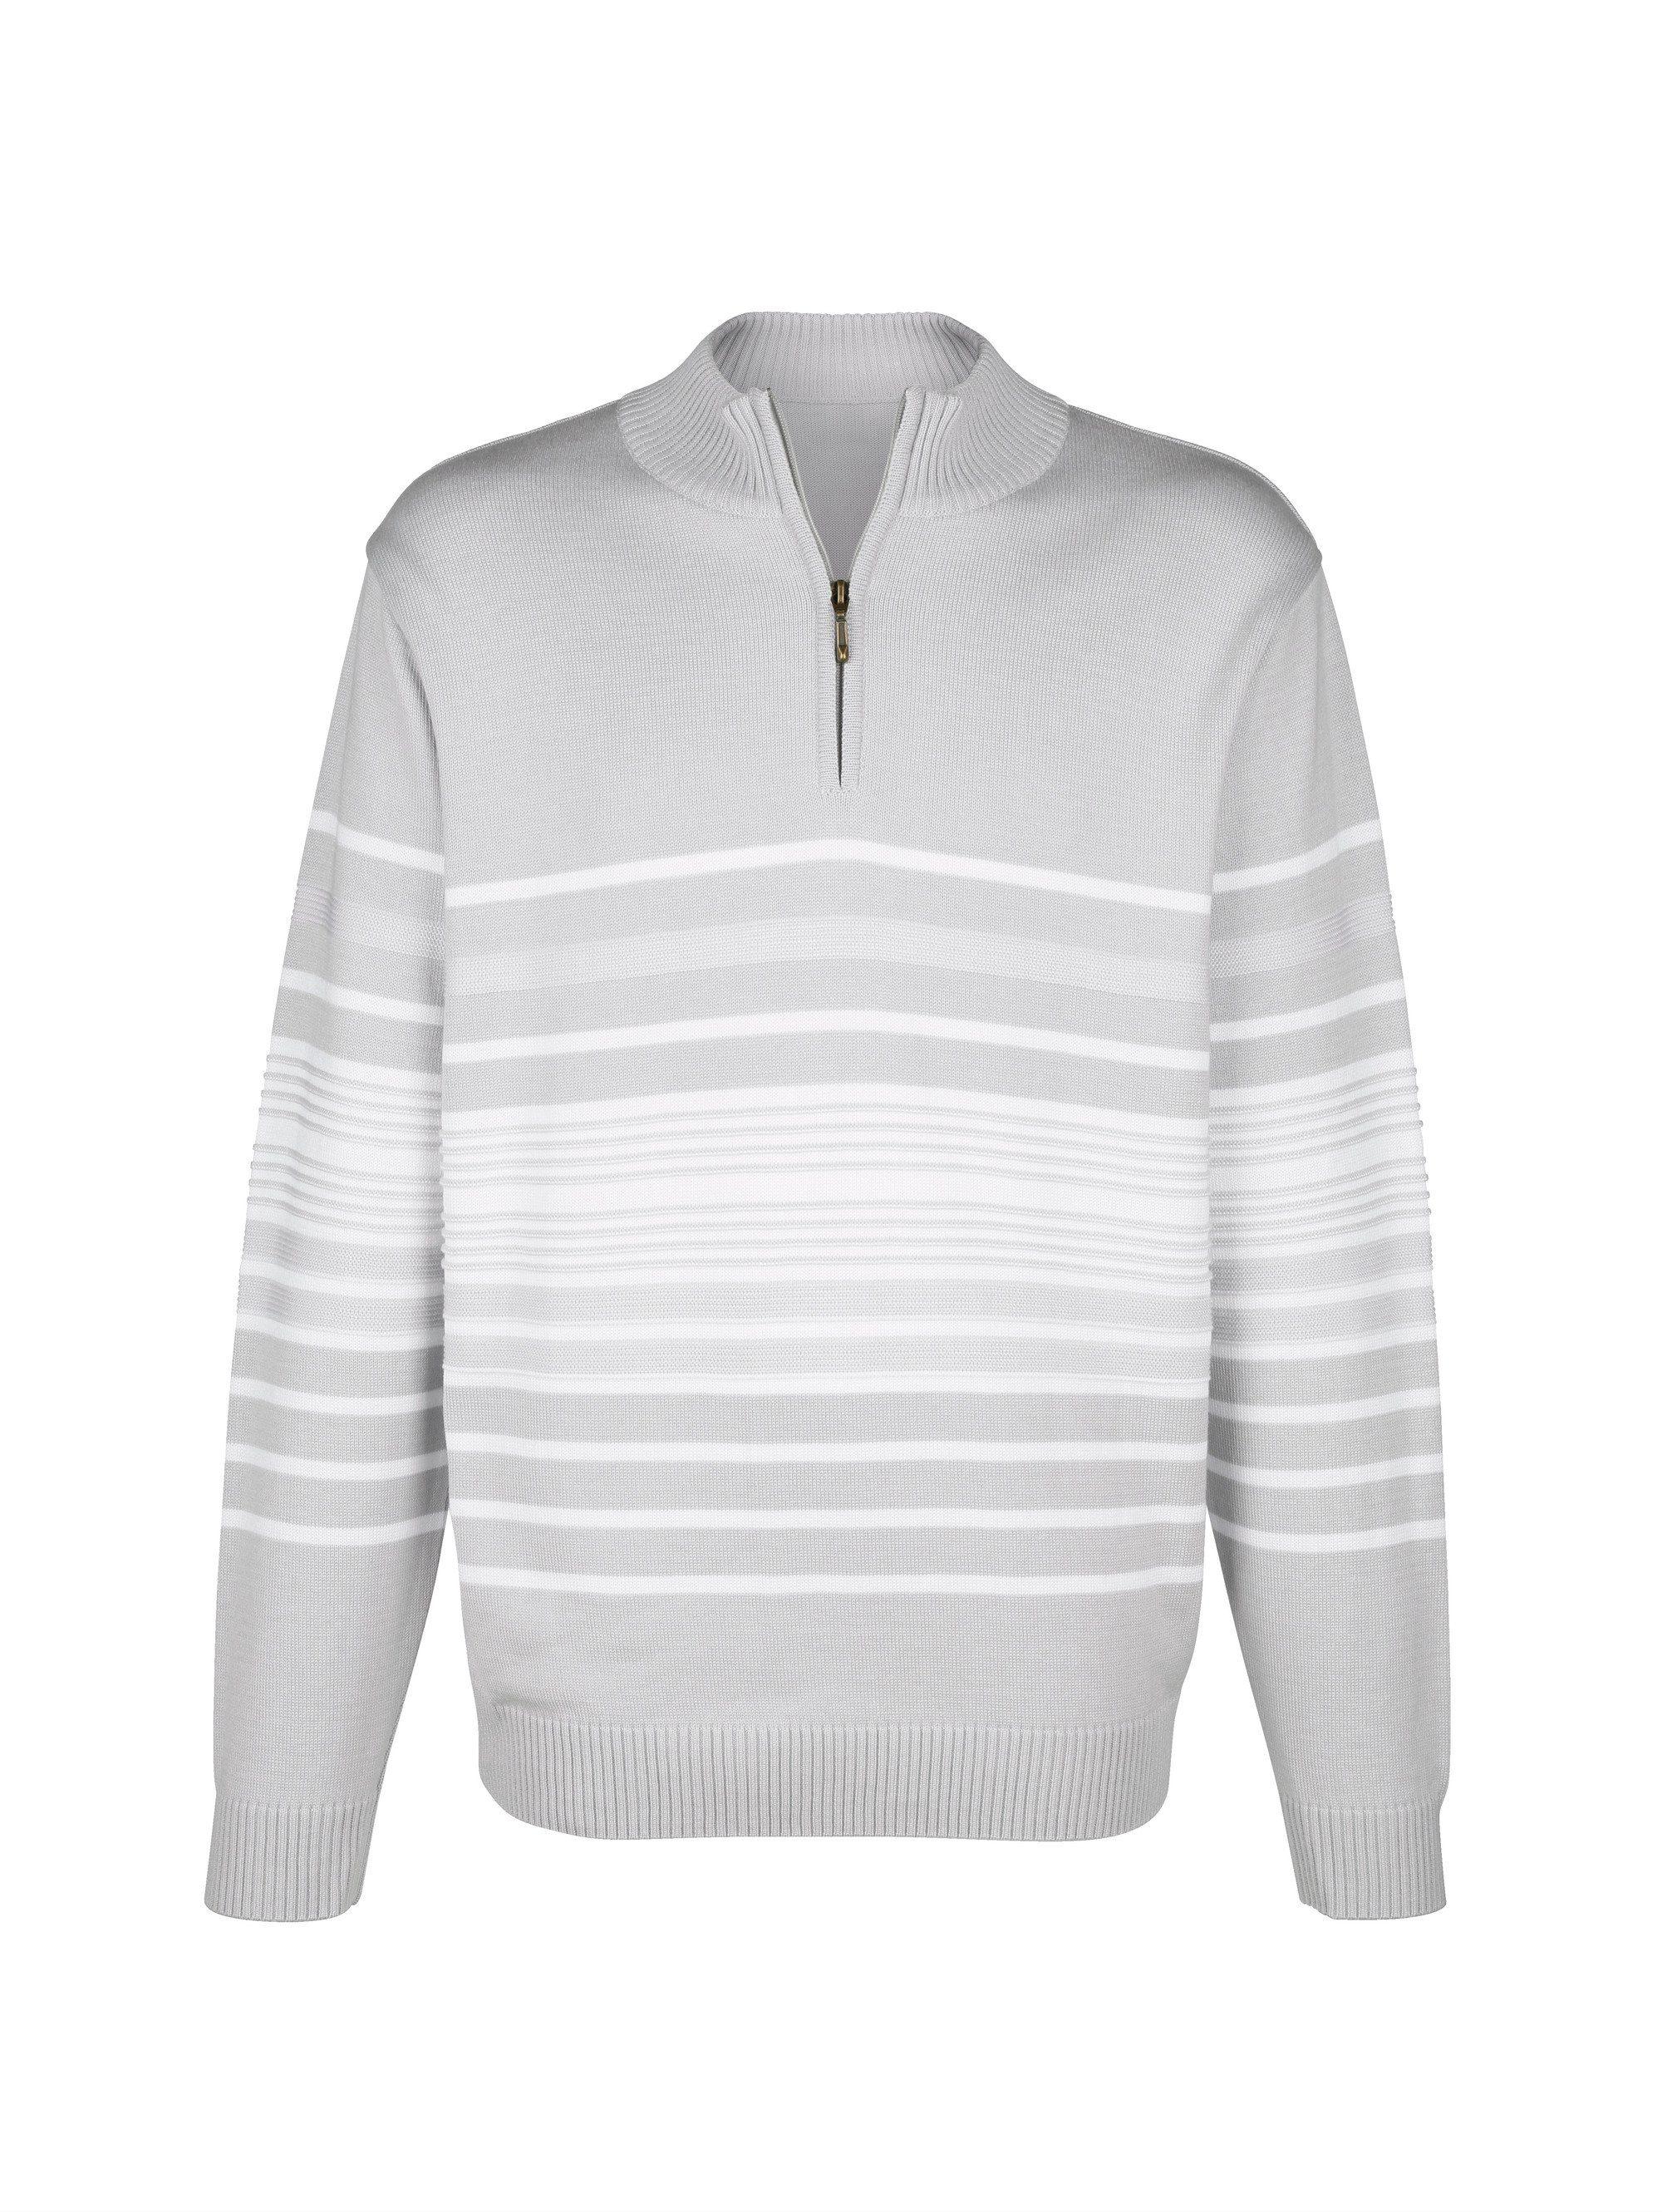 13e76fe8cbb7 roger-kent Sonstige Pullover für Herren online kaufen   Herrenmode ...